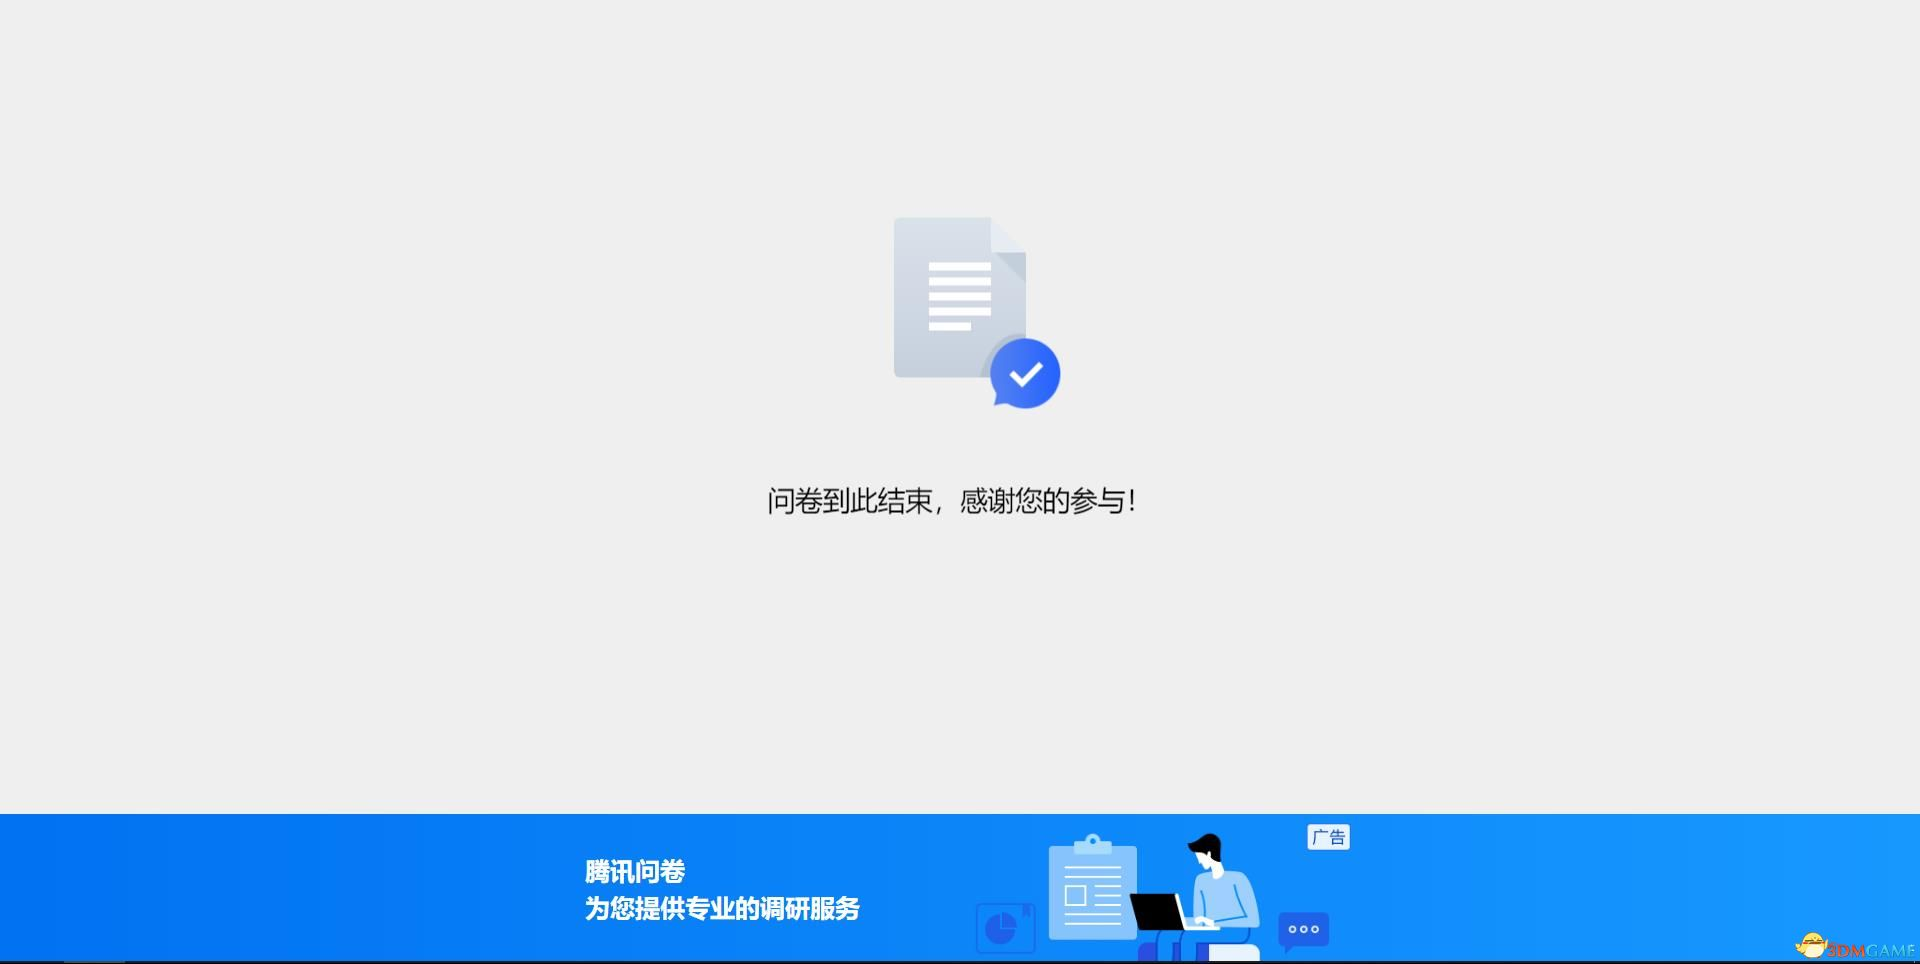 QQ浏览器截图20190126110118.jpg